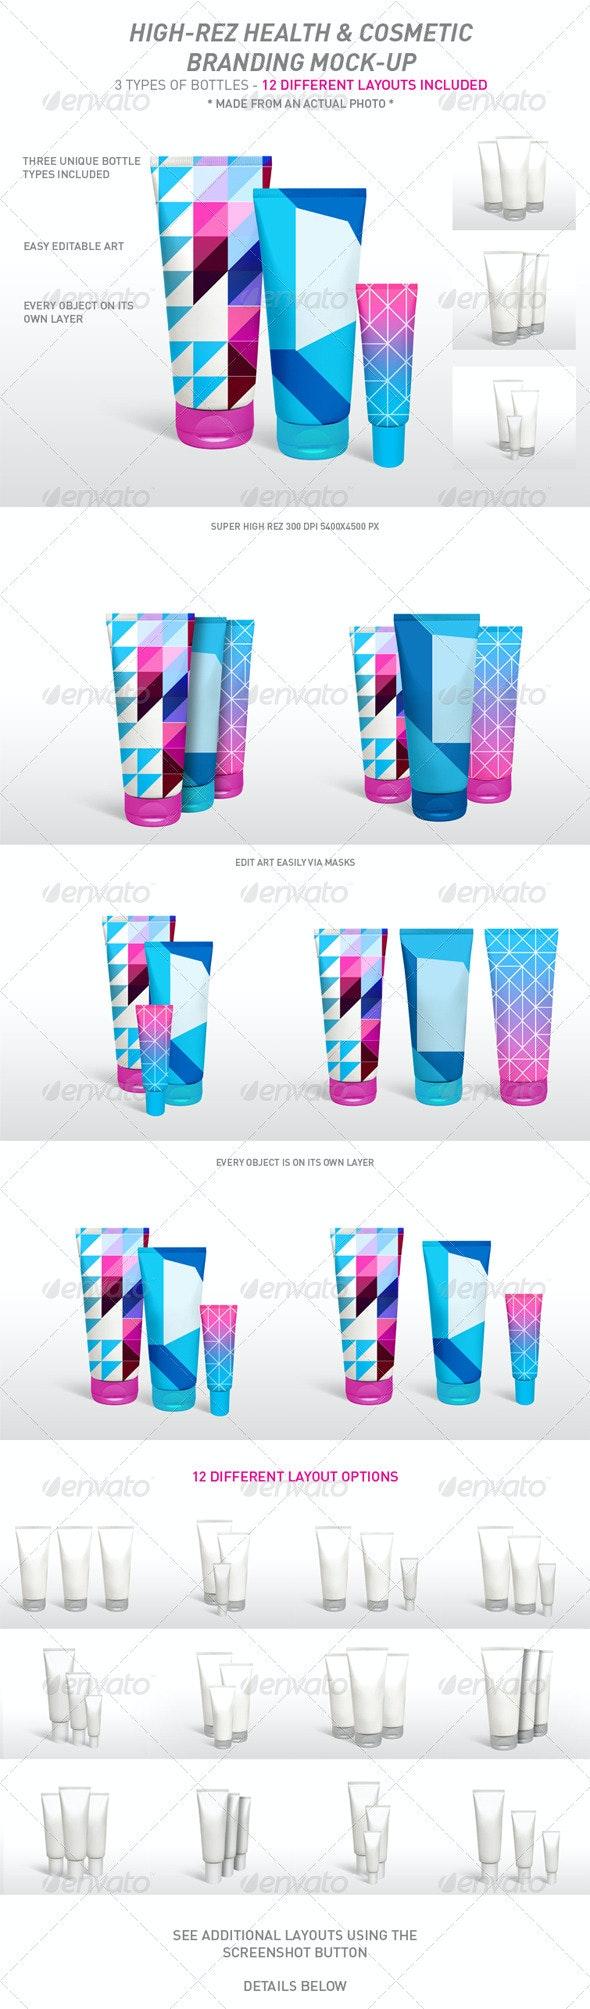 Health & Cosmetic Product Branding Mock-Ups - Beauty Packaging